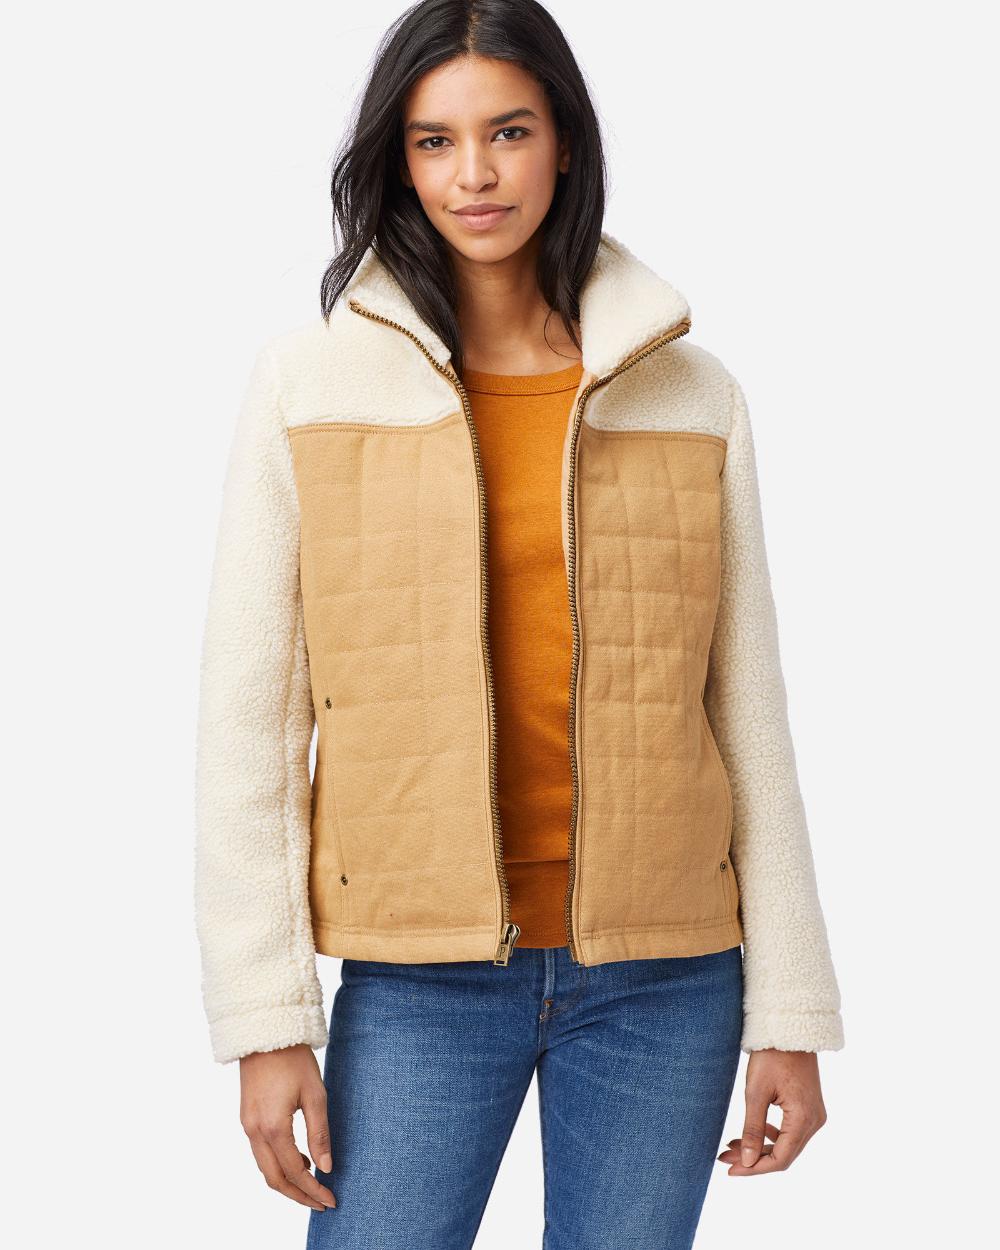 Women S Salida Canvas Sherpa Jacket Sherpa Jacket Wool Jackets Women Winter Coats Women Wool [ 1250 x 1000 Pixel ]